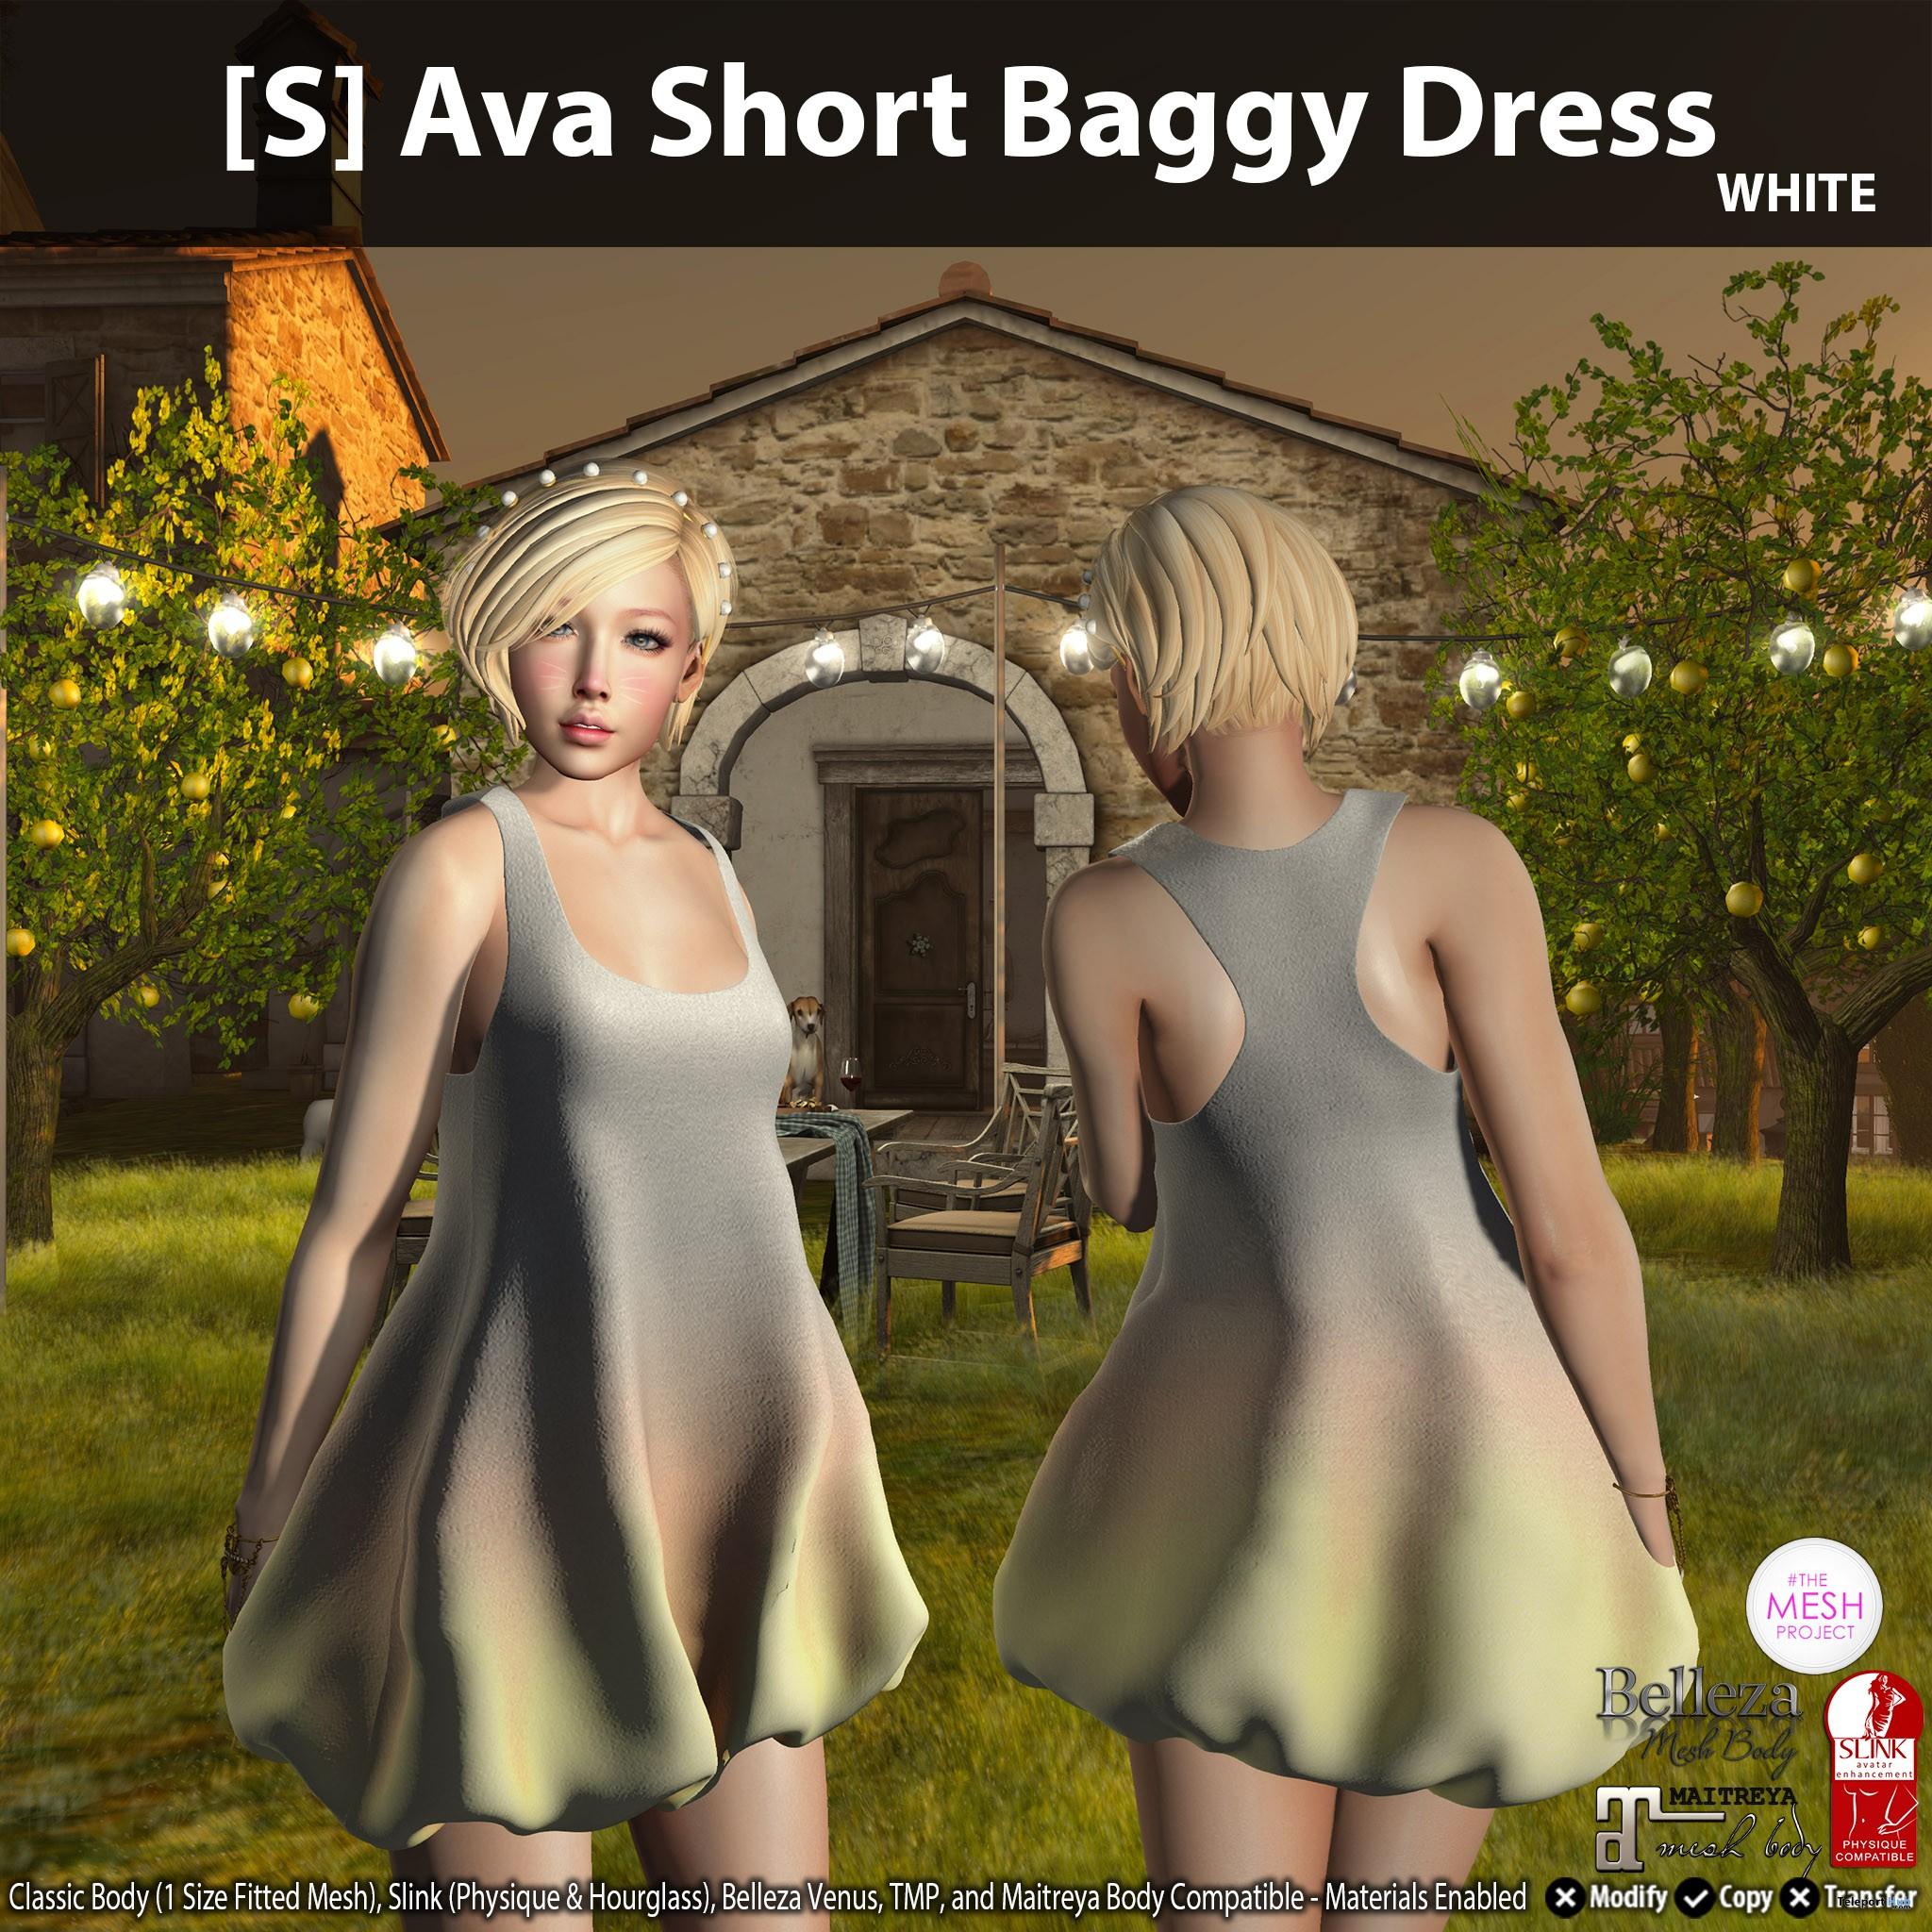 New Release: [S] Ava Short Baggy Dress by [satus Inc] - Teleport Hub - teleporthub.com